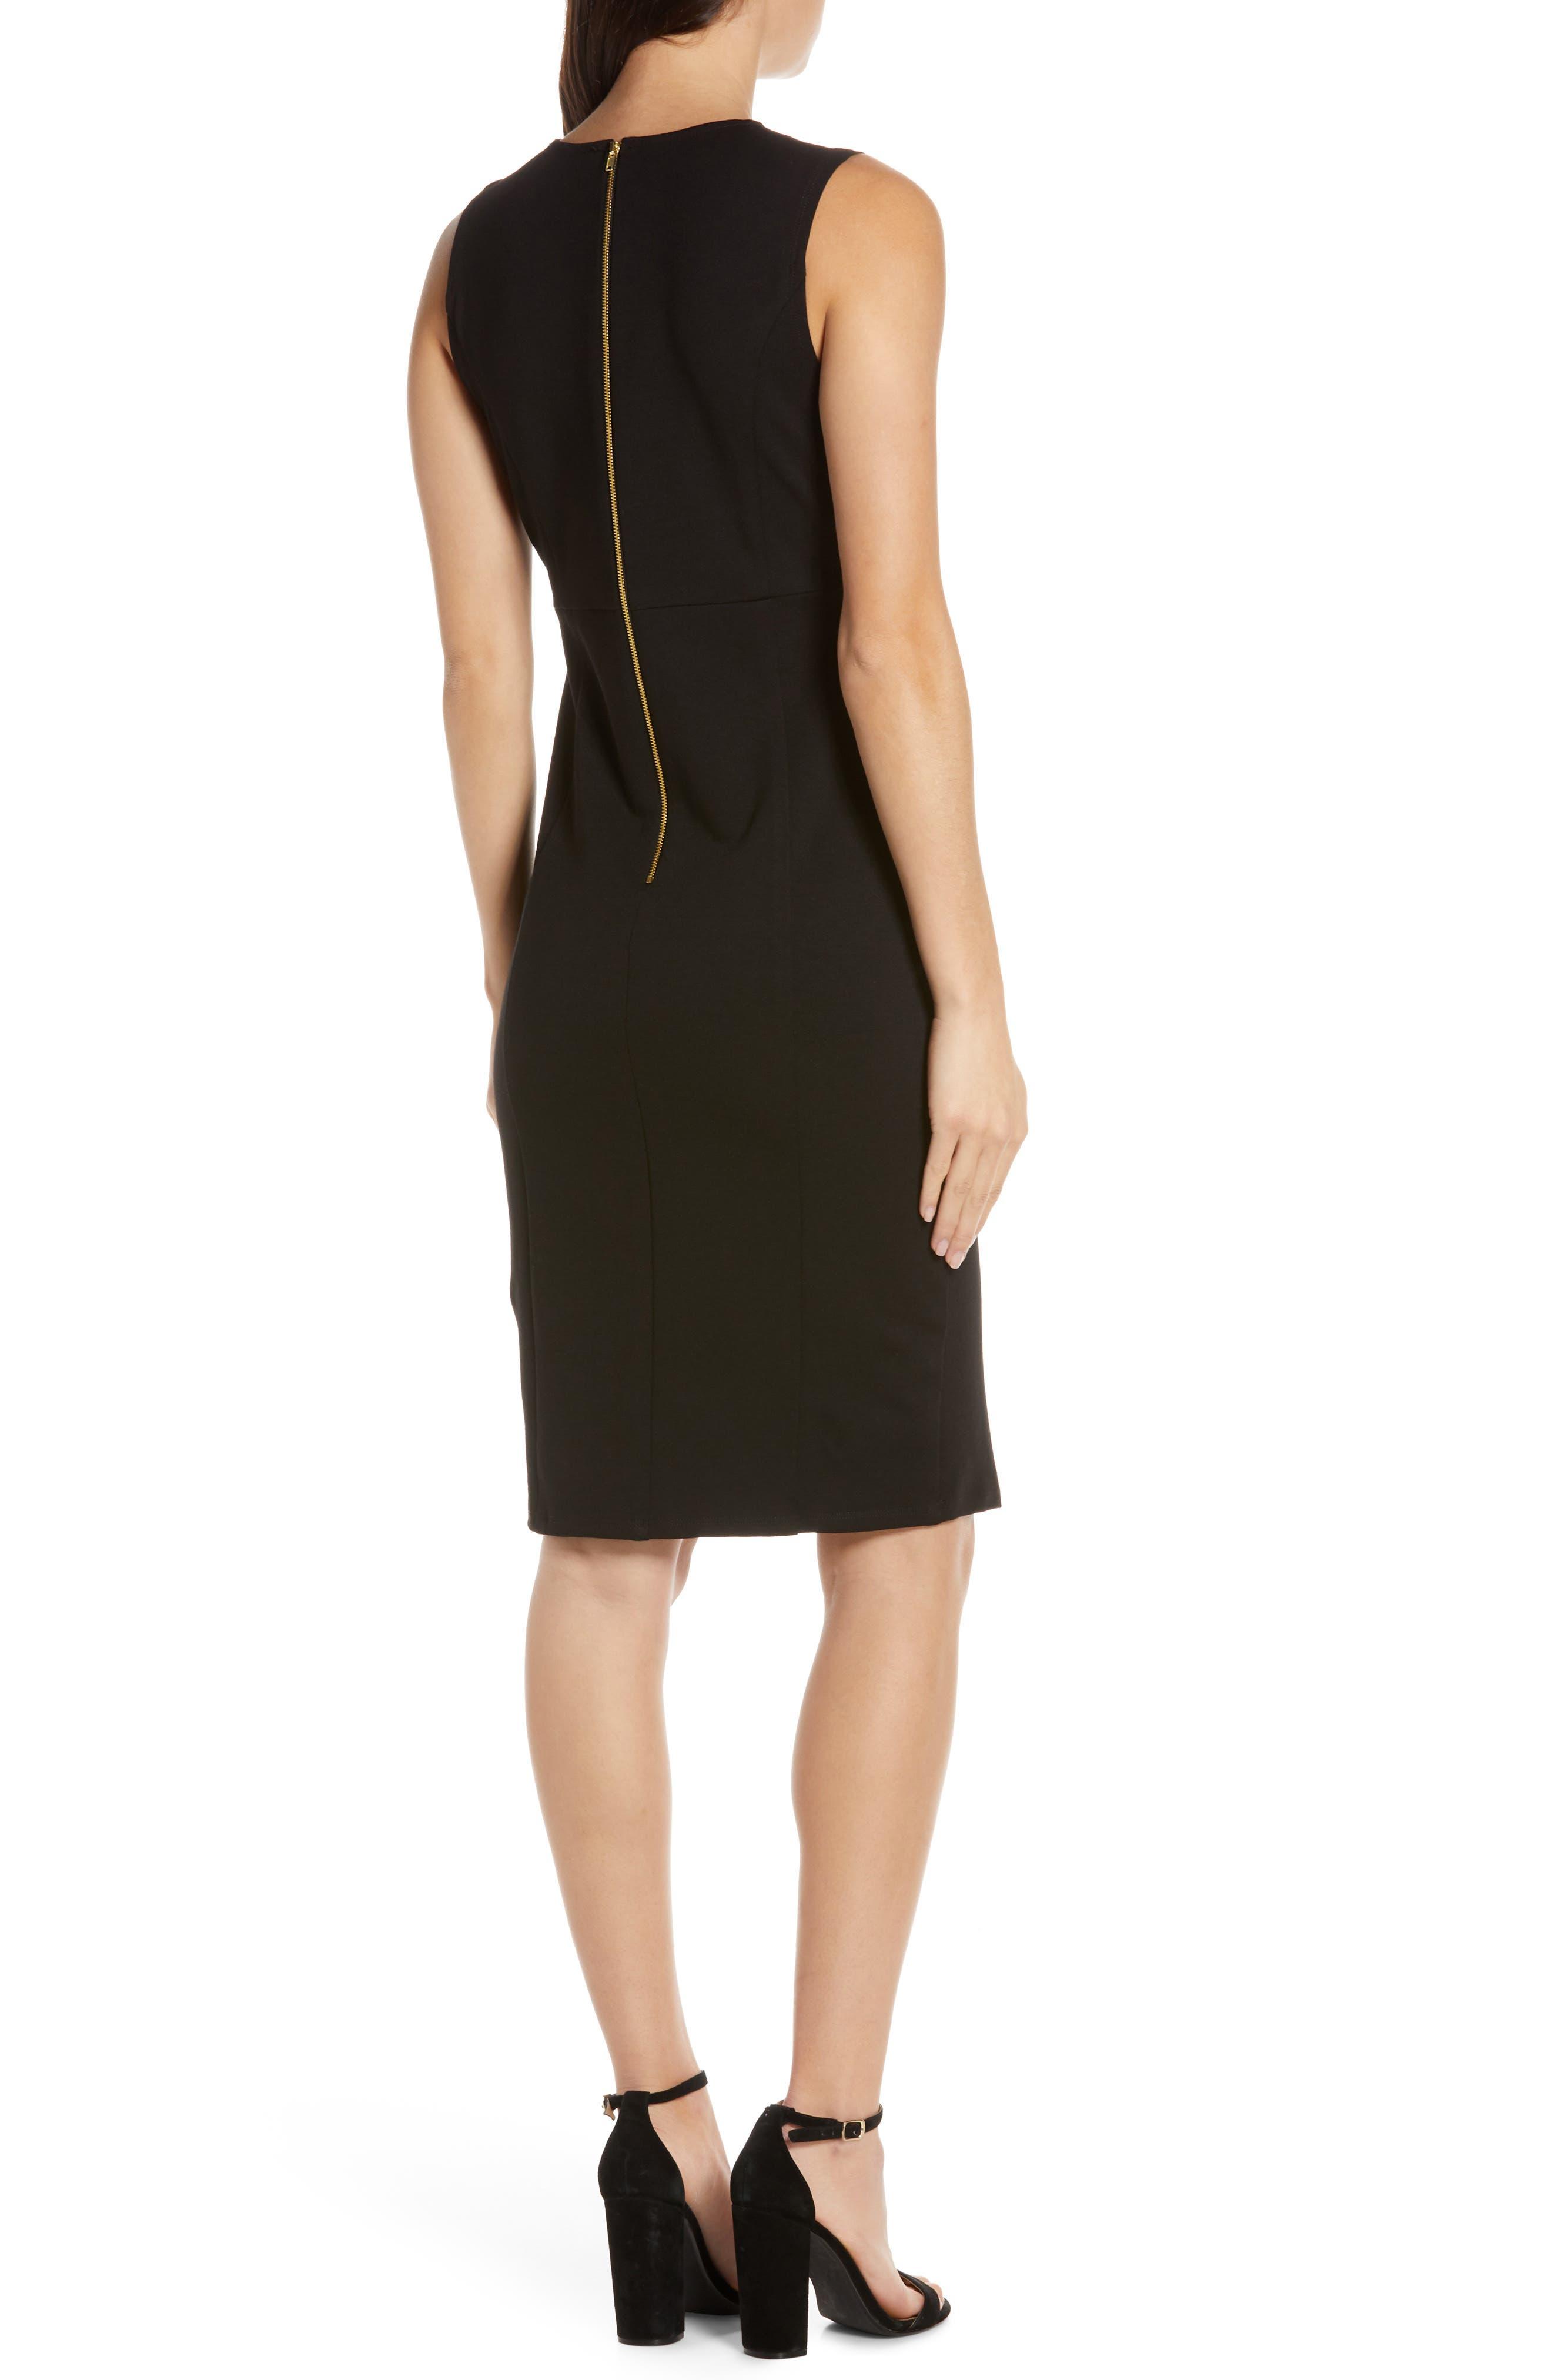 CHARLES HENRY, Sleeveless Sheath Dress, Alternate thumbnail 2, color, BLACK